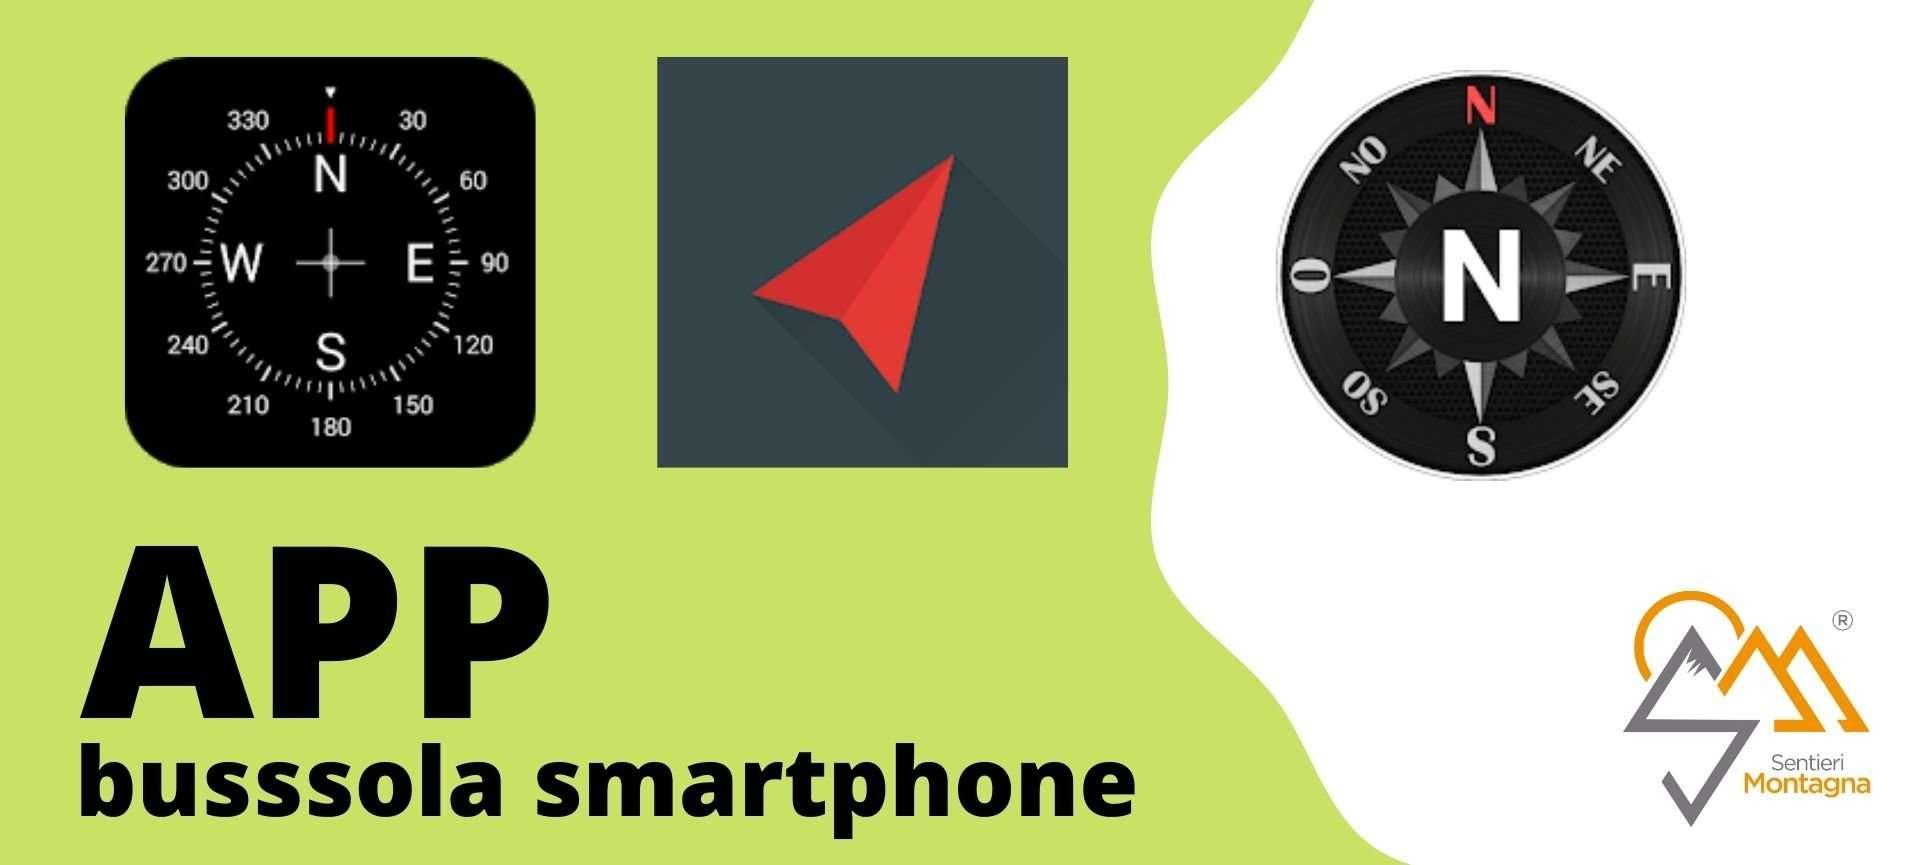 bussola app gratis